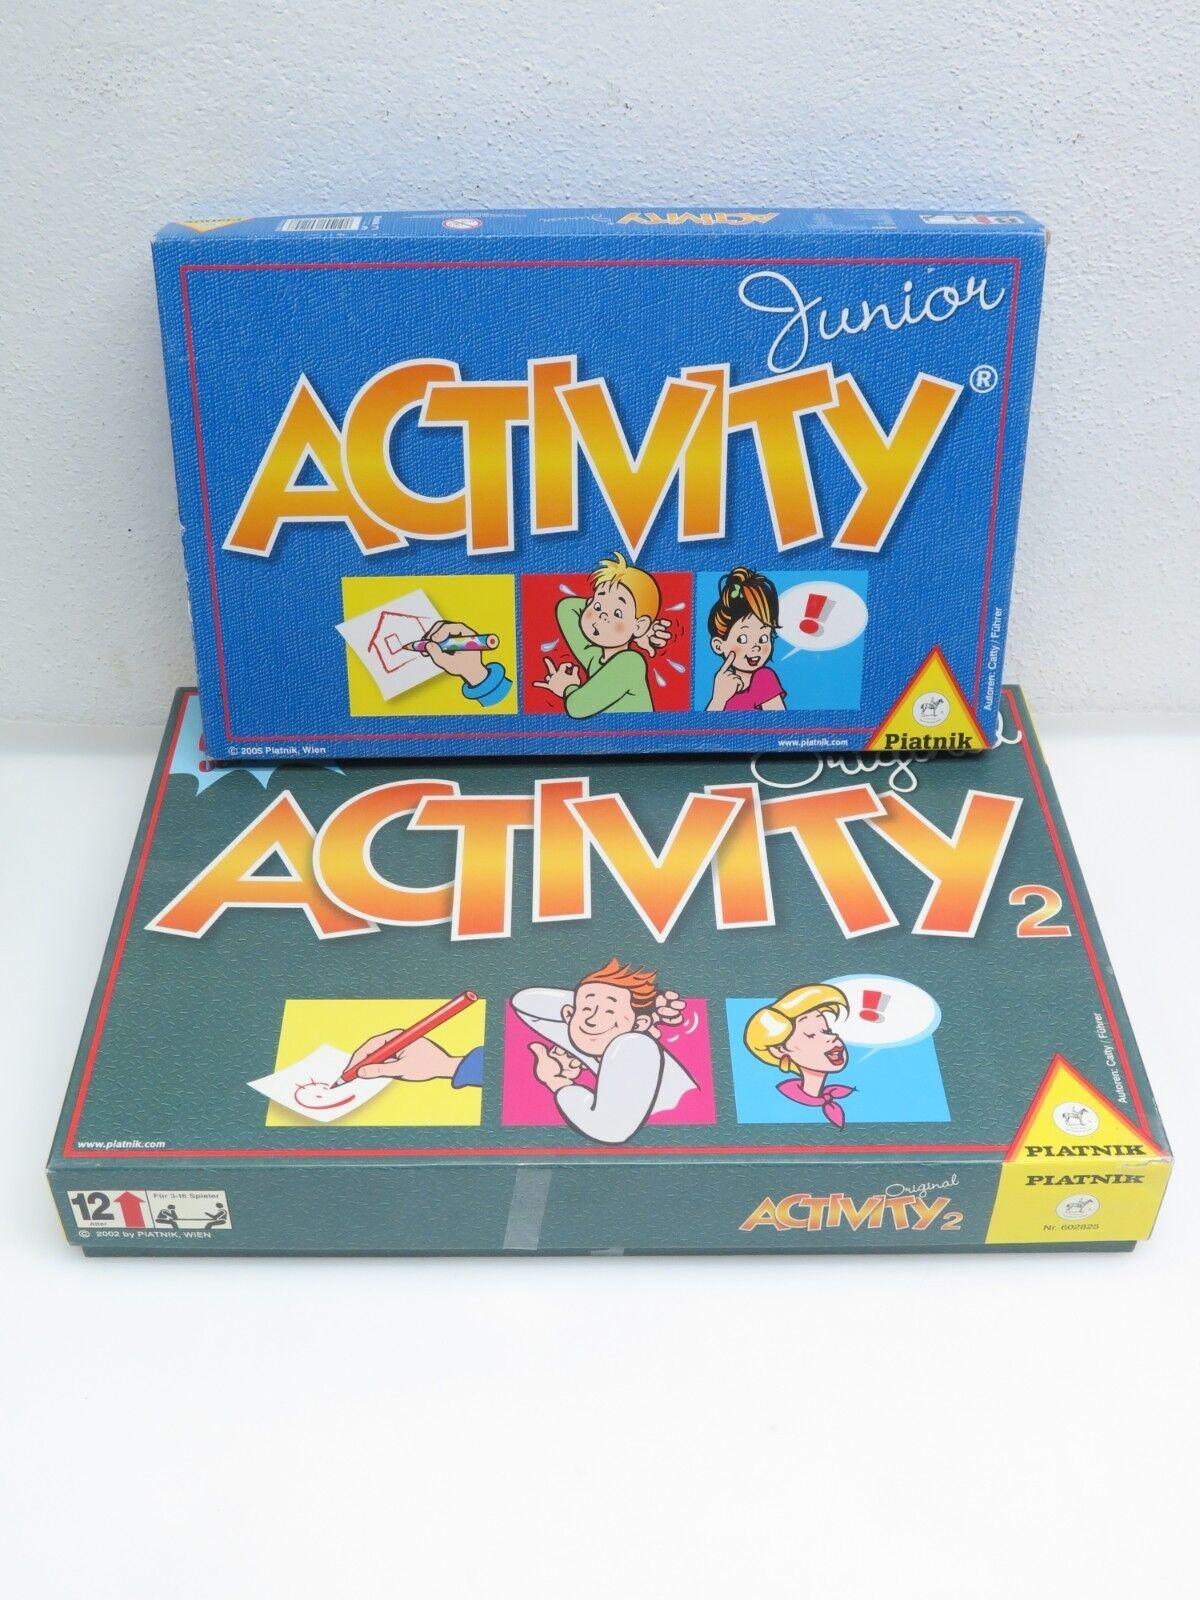 Bundle Activity 2 (2002) und Activity Junior (2005) Spiel Piatnik 601248 602825